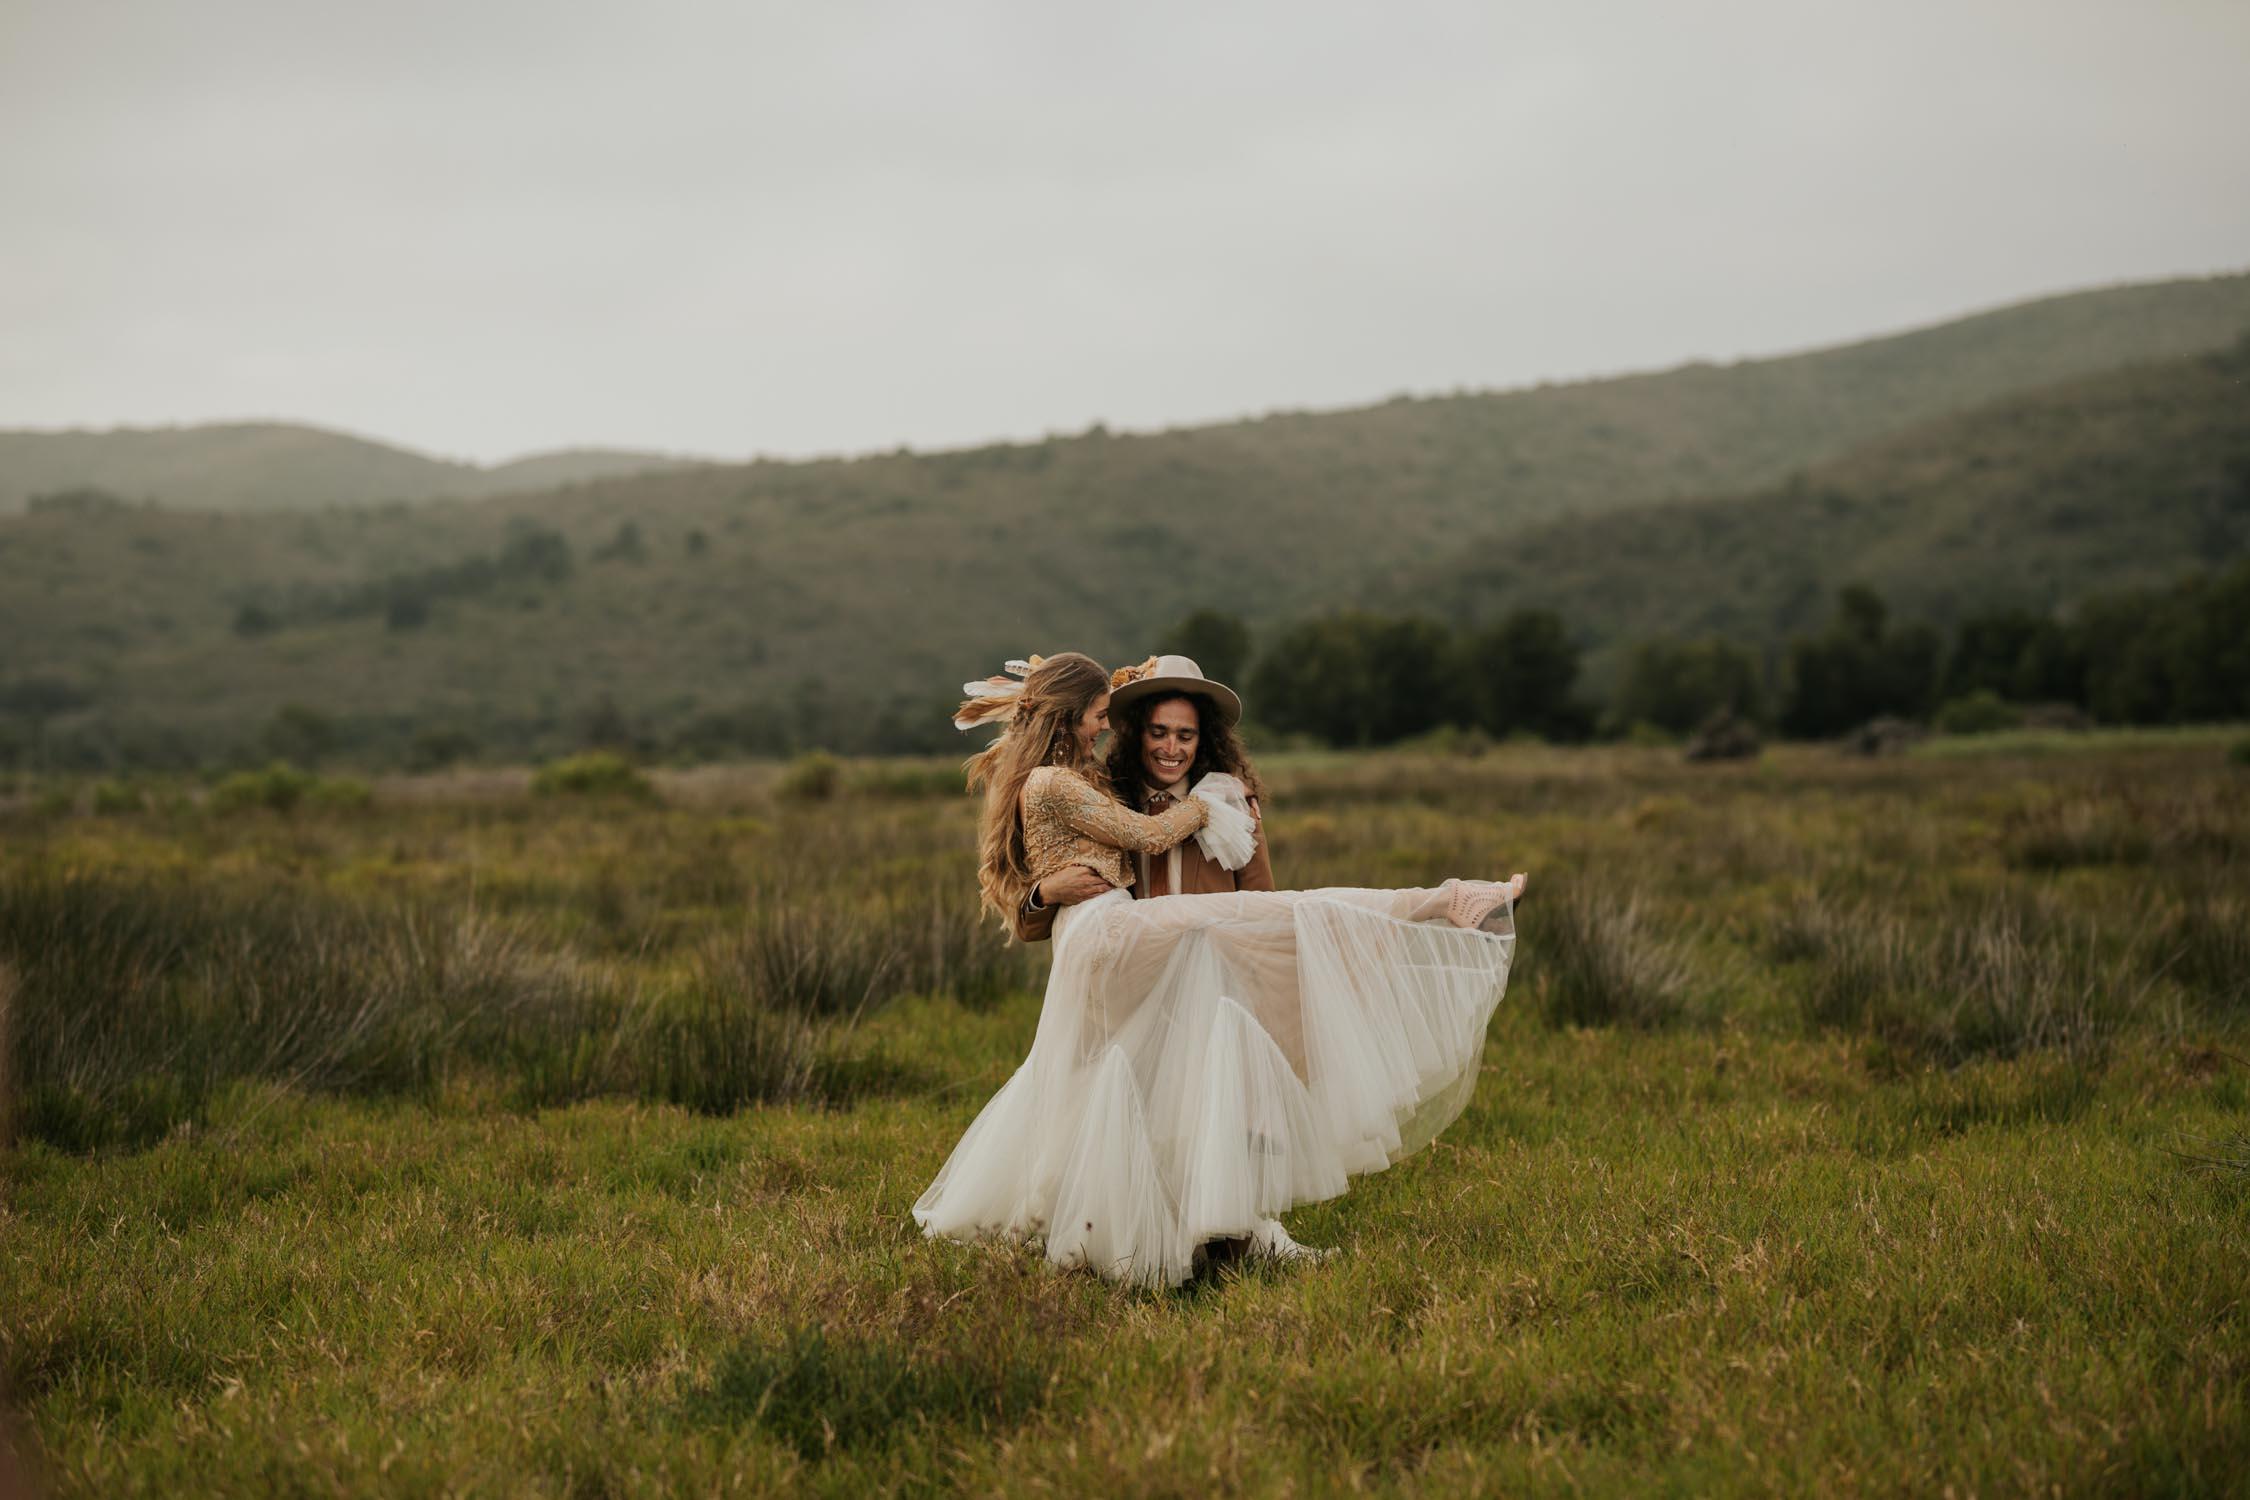 Ultimate Boho bride and groom